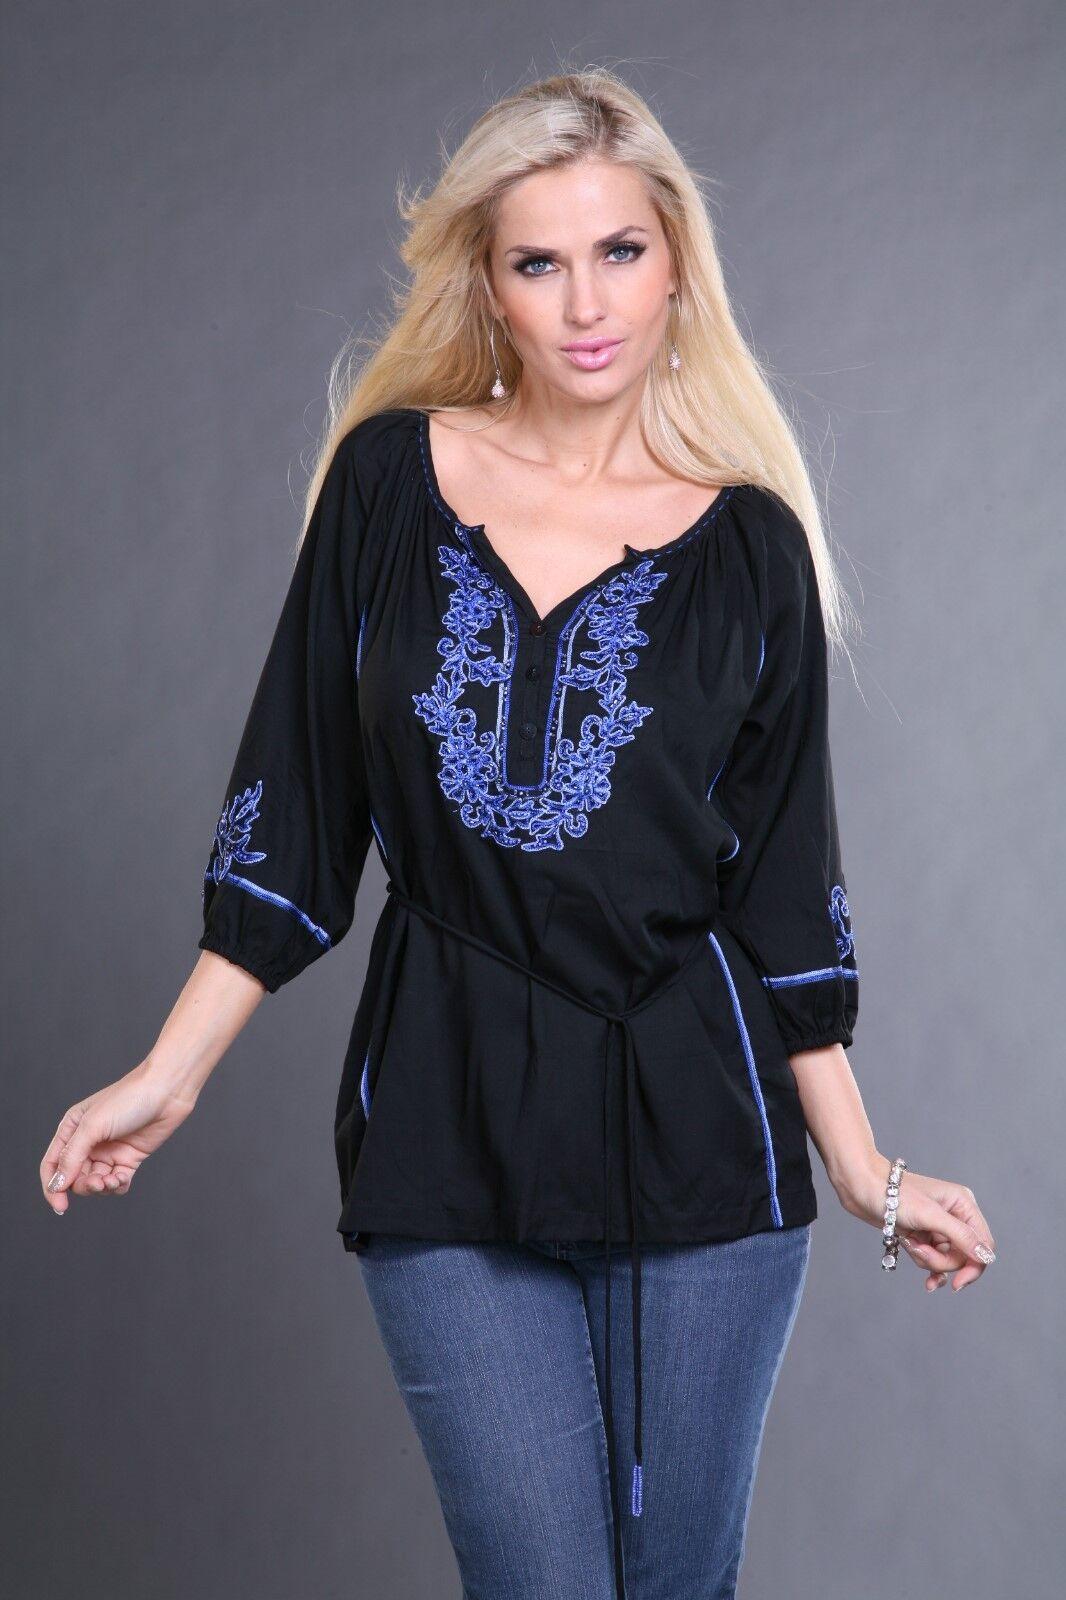 Woherren Top Tunic Blouse Krista Lee Simba schwarz Blau Embroidery Embellished